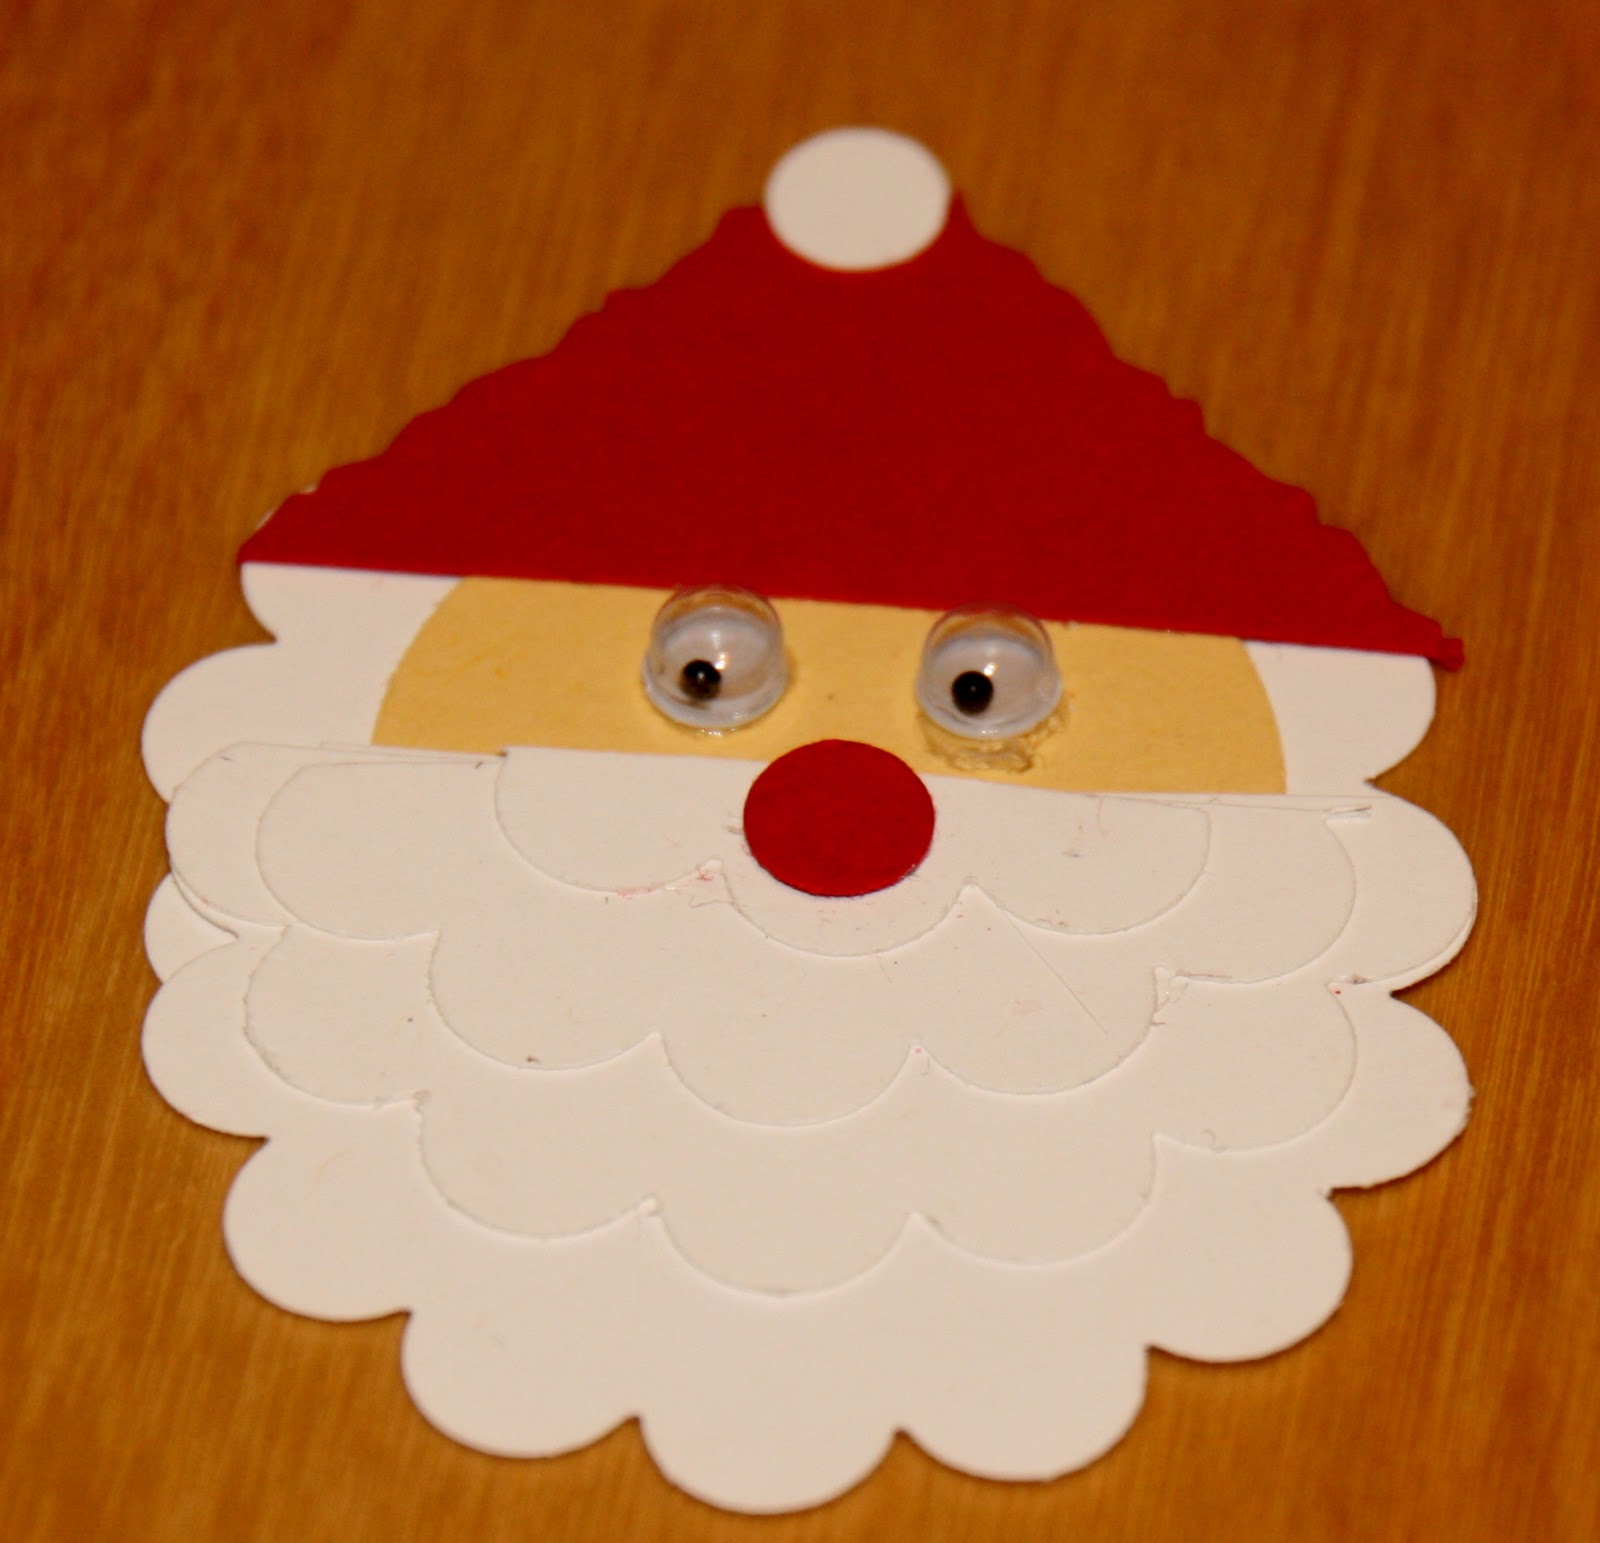 Bastelzauber ingolstadt der nikolaus kann kommen for Nikolaus dekoration basteln